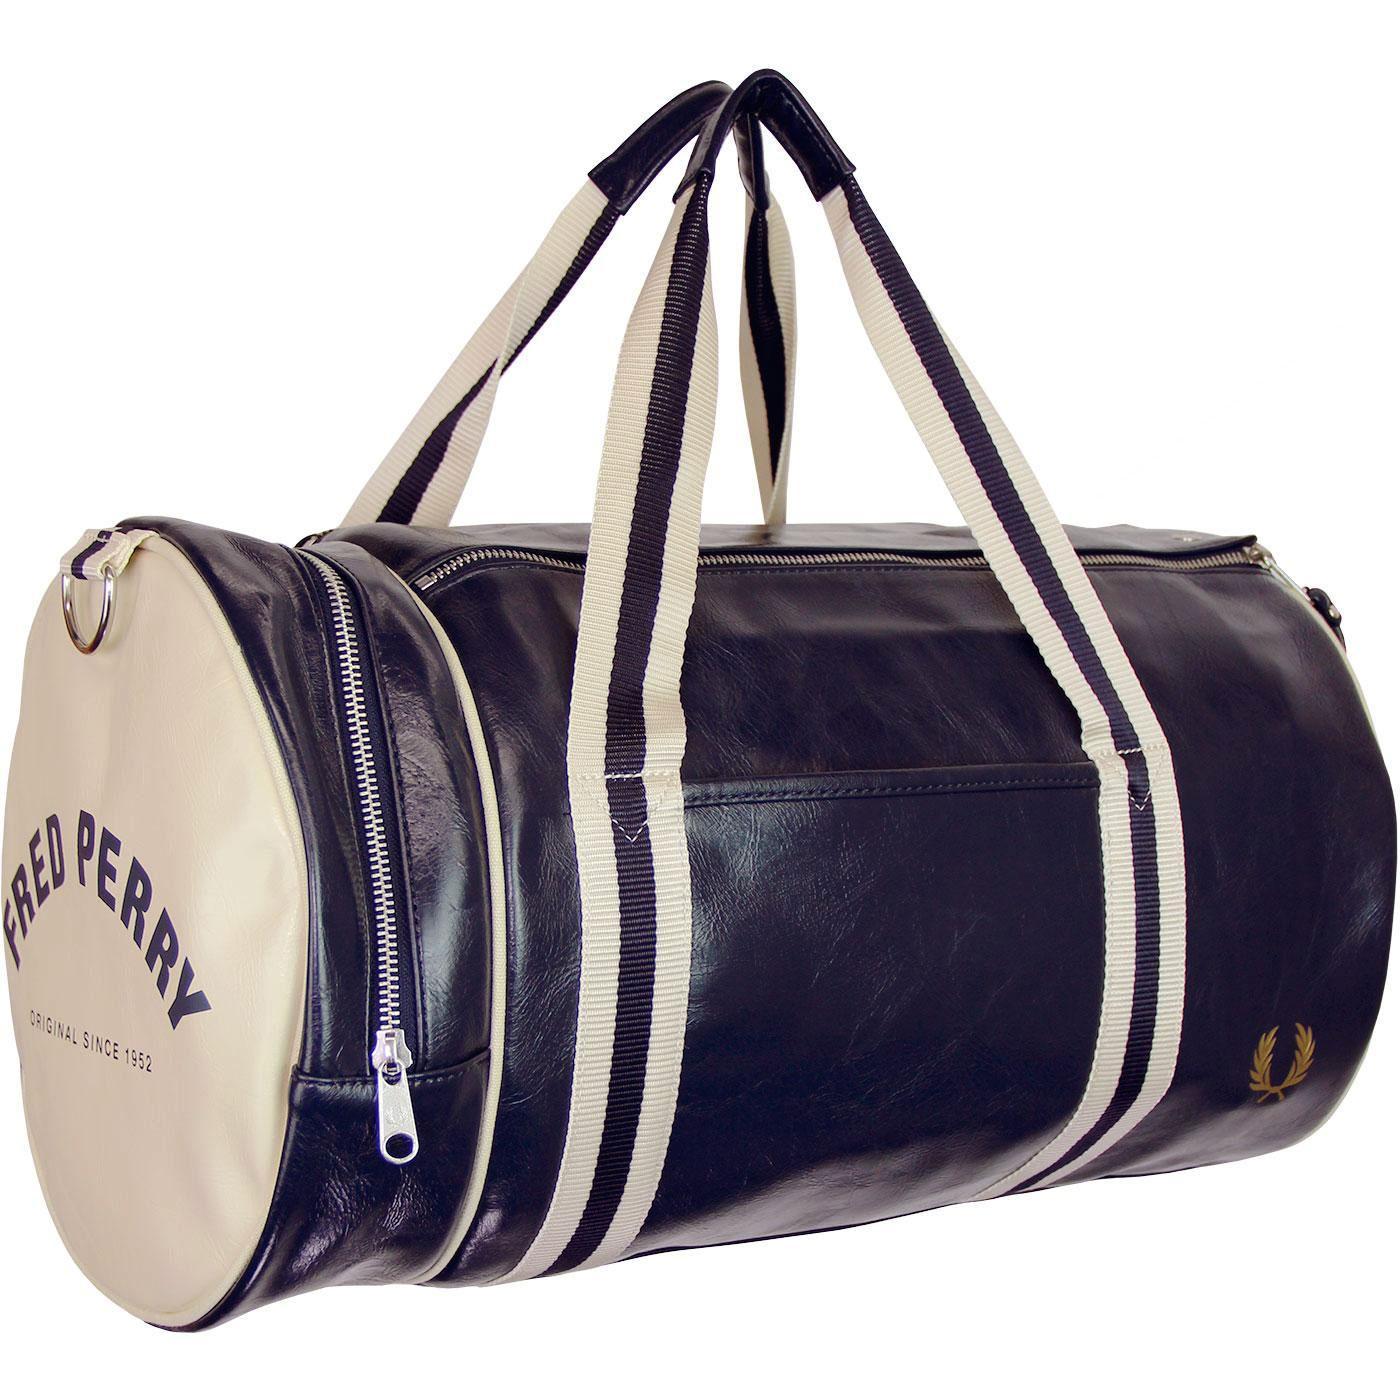 FRED PERRY Retro Classic Barrel Bag - Navy